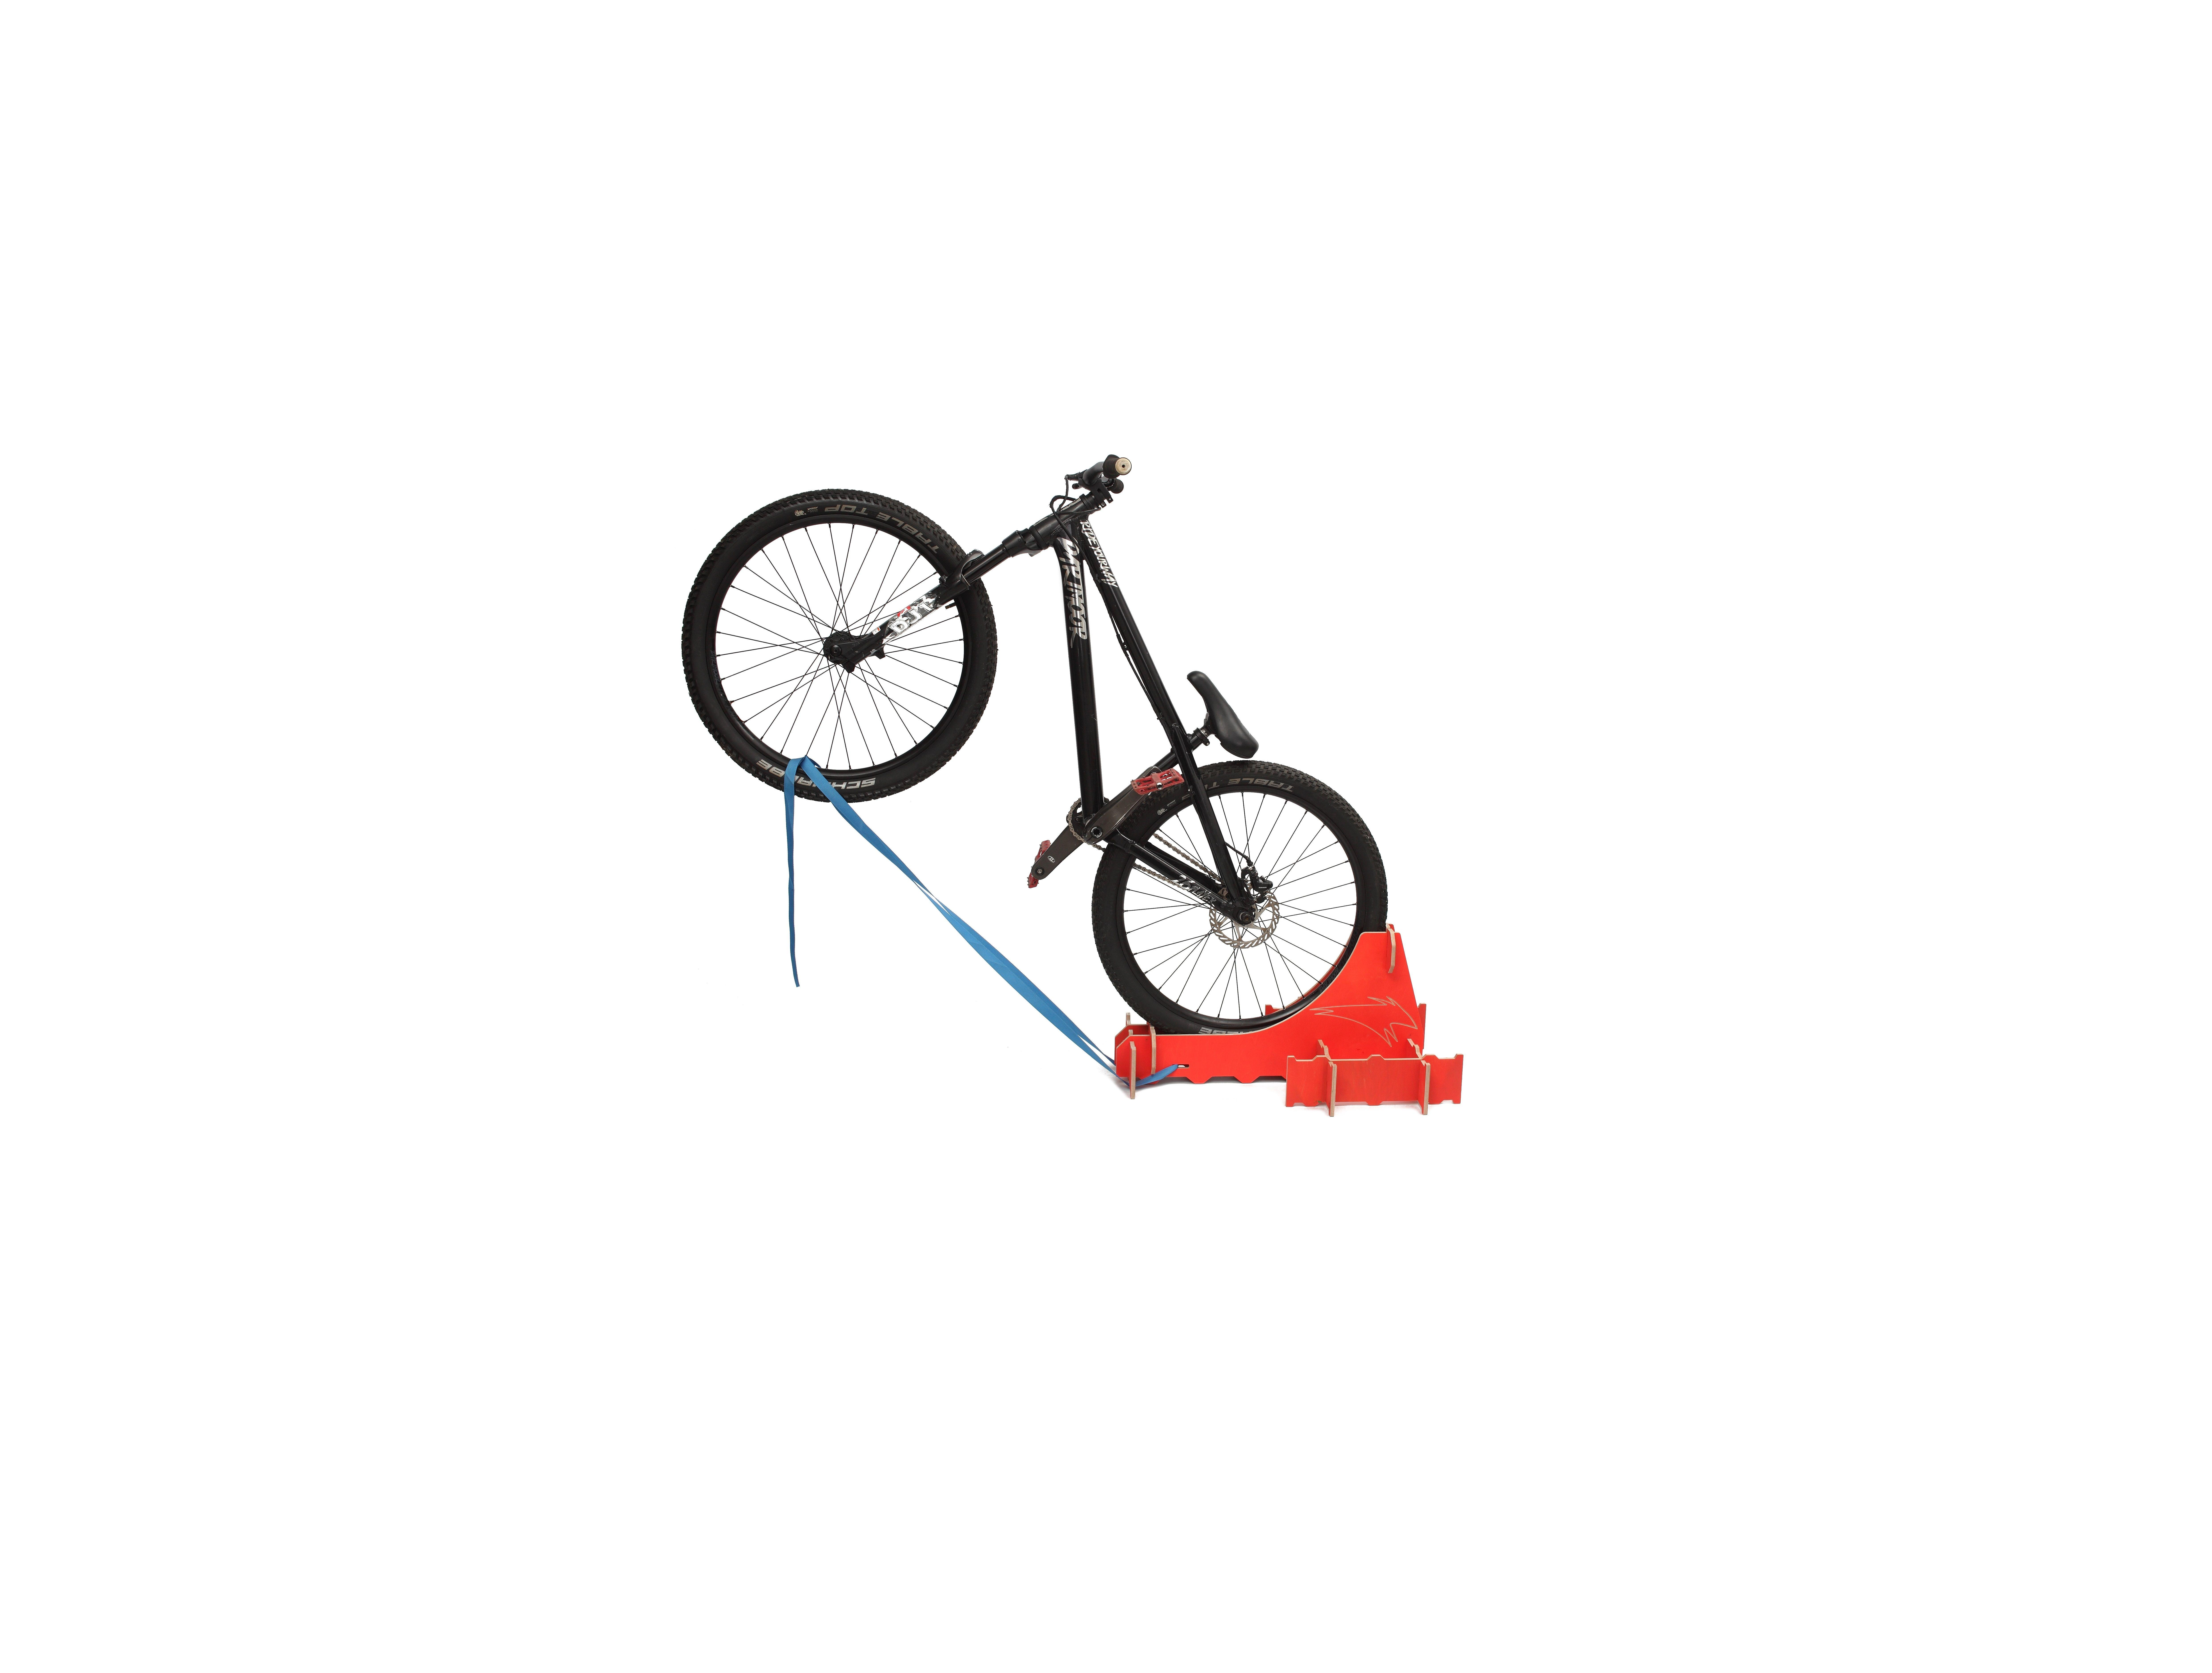 Byclex Manual Trainer Machine Bicycle Bike Bike Trainer Bicycle